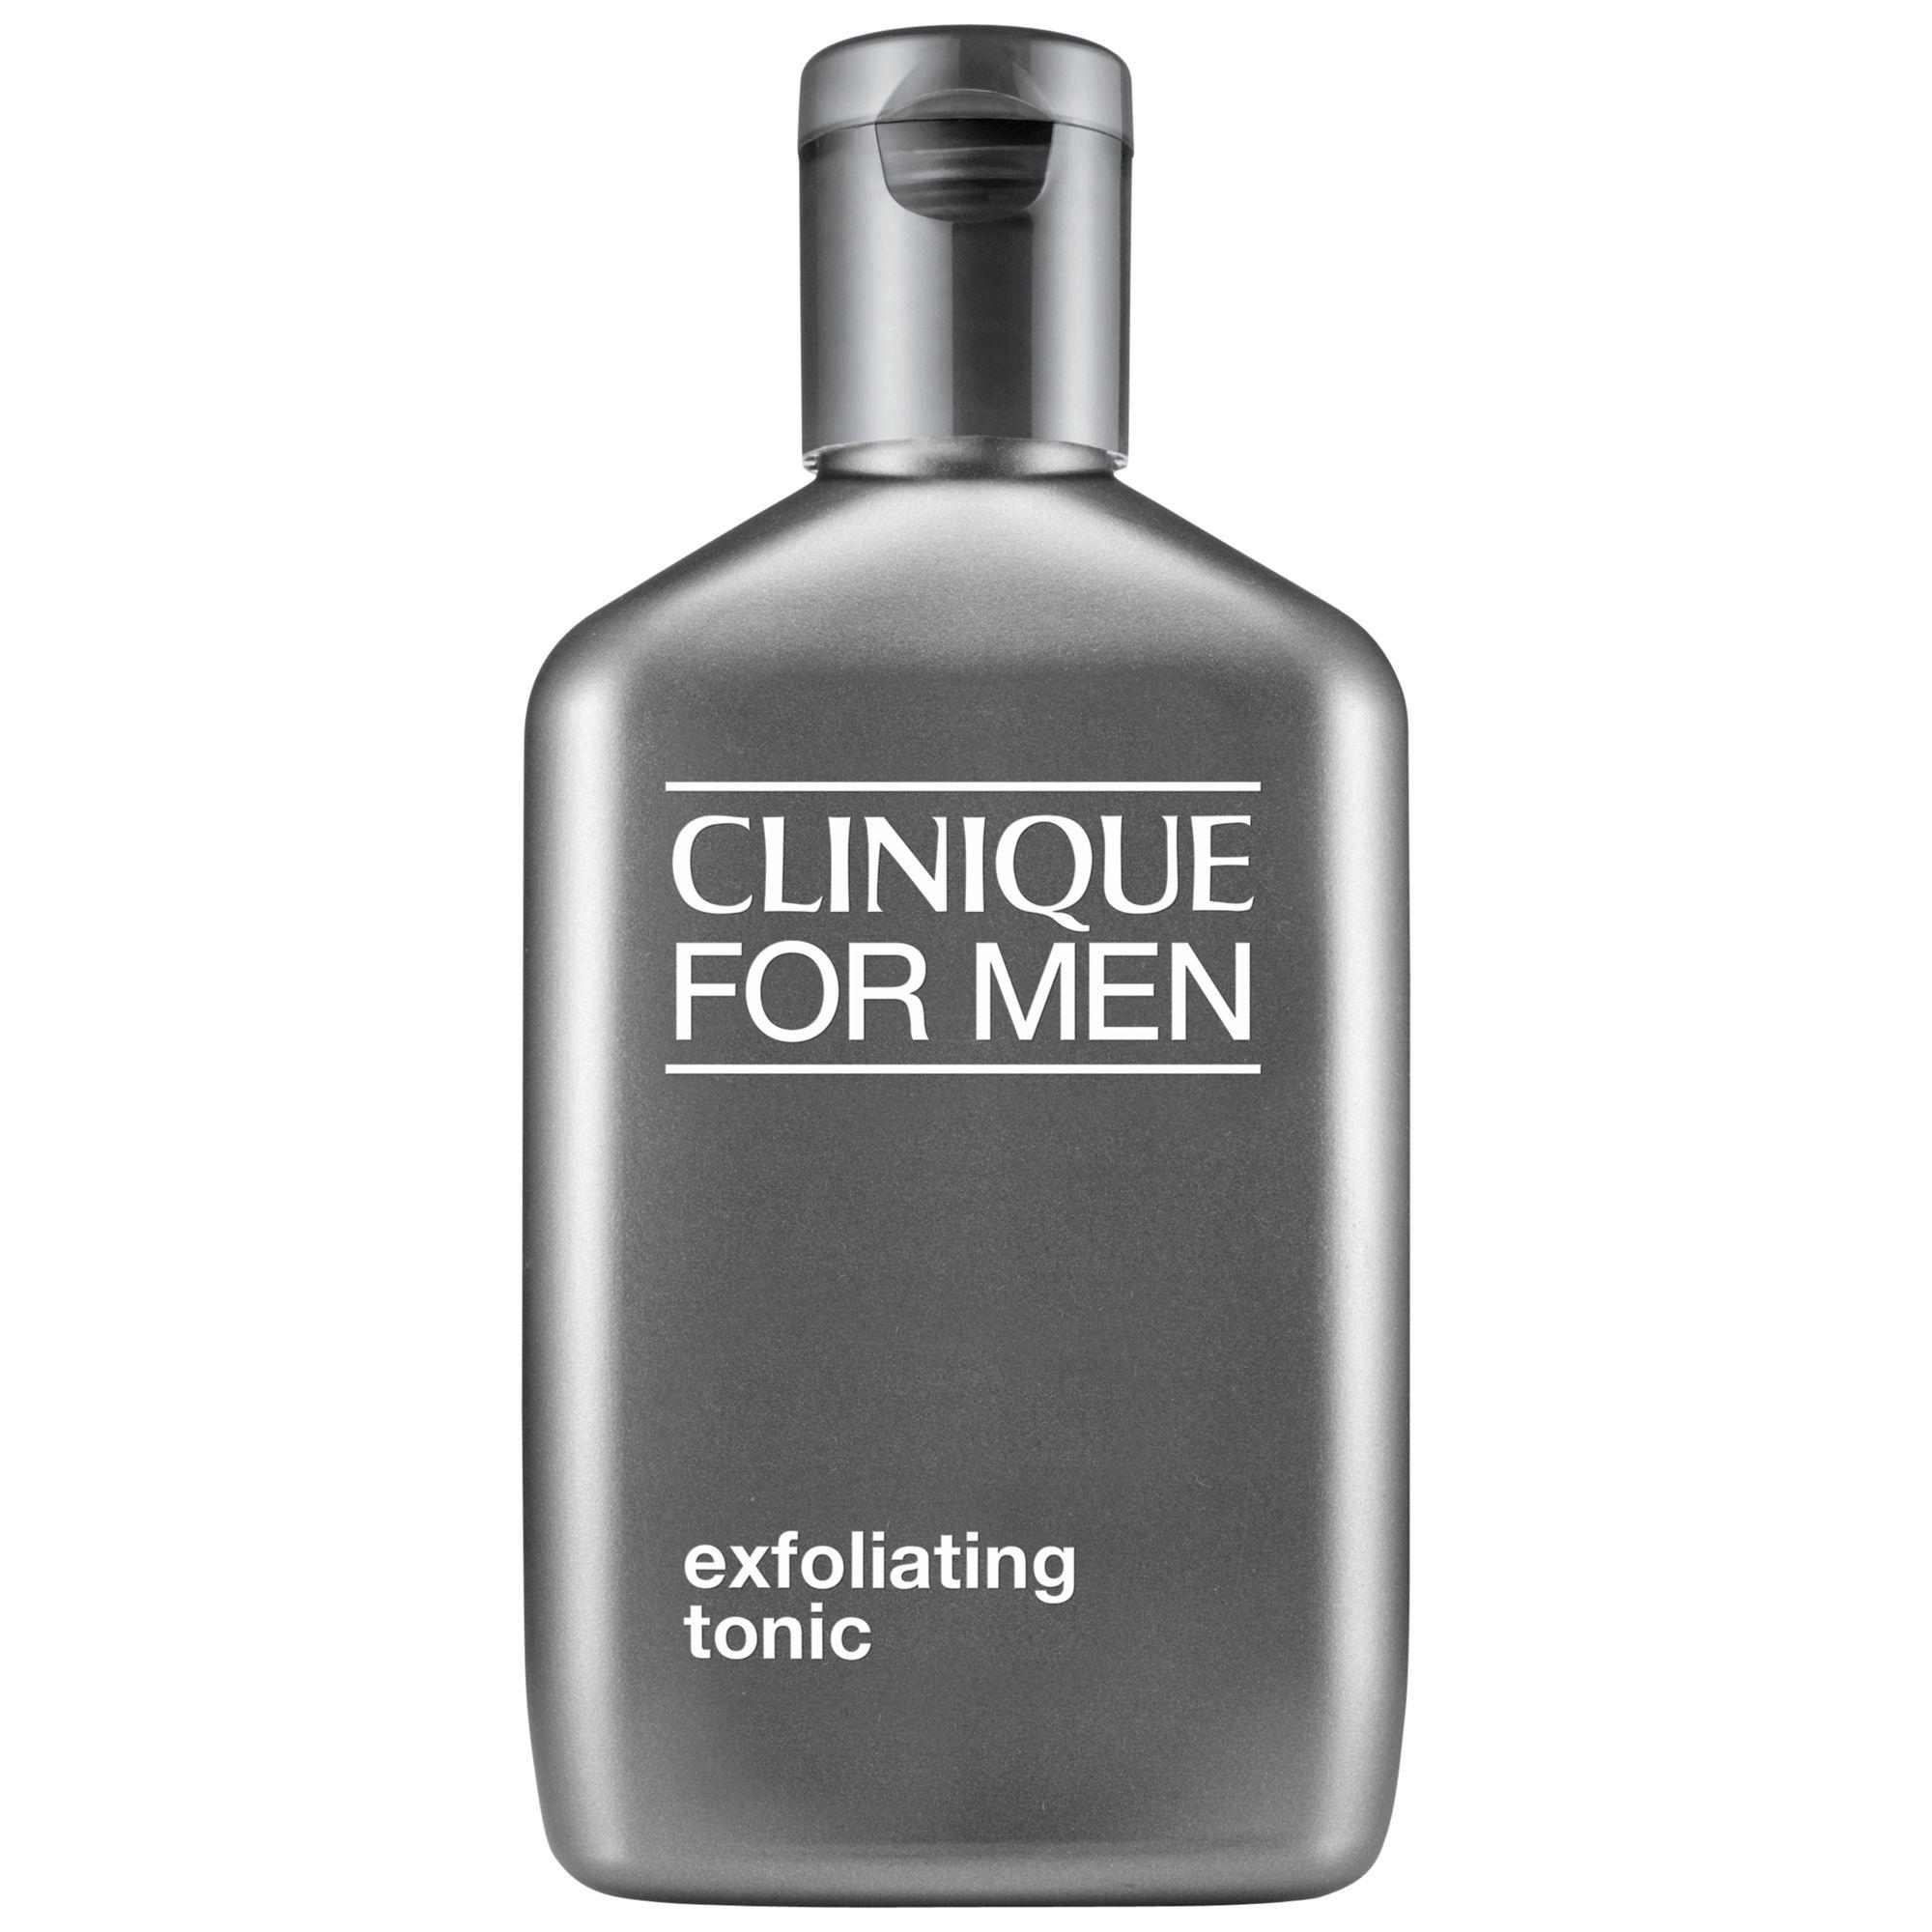 Clinique Clinique For Men Exfoliating Tonic, 200ml